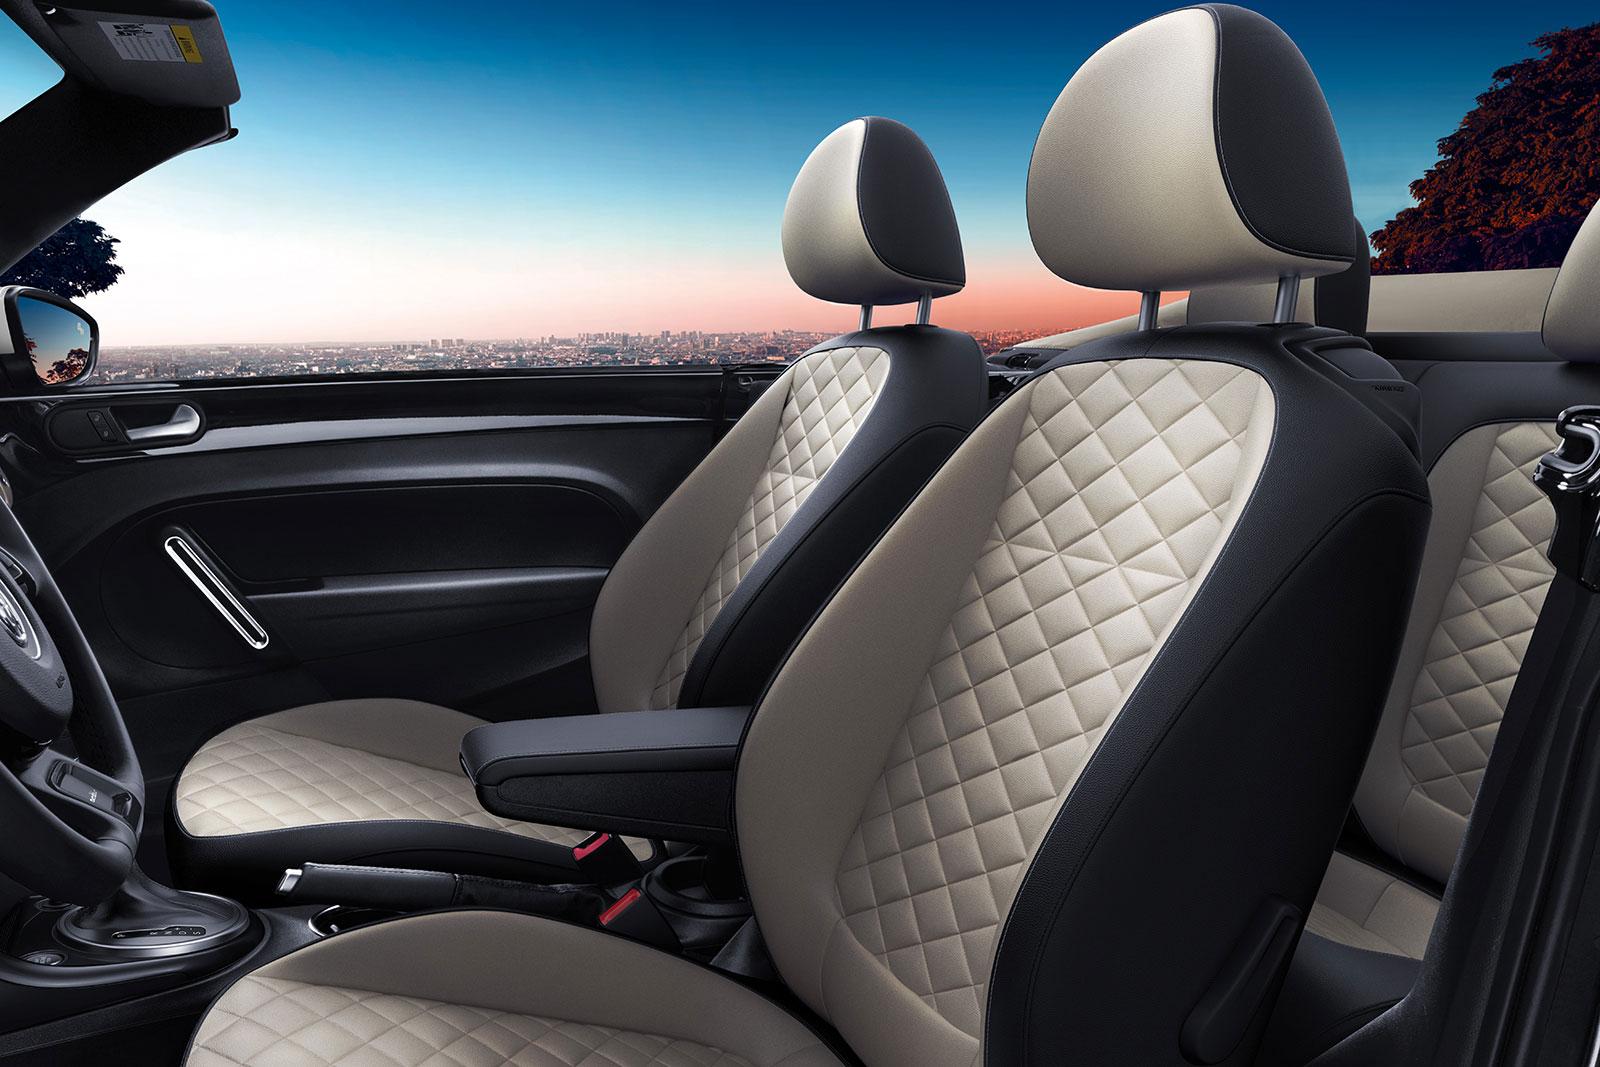 2019 Volkswagen Beetle Convertible Irvine Auto Center Irvine Ca